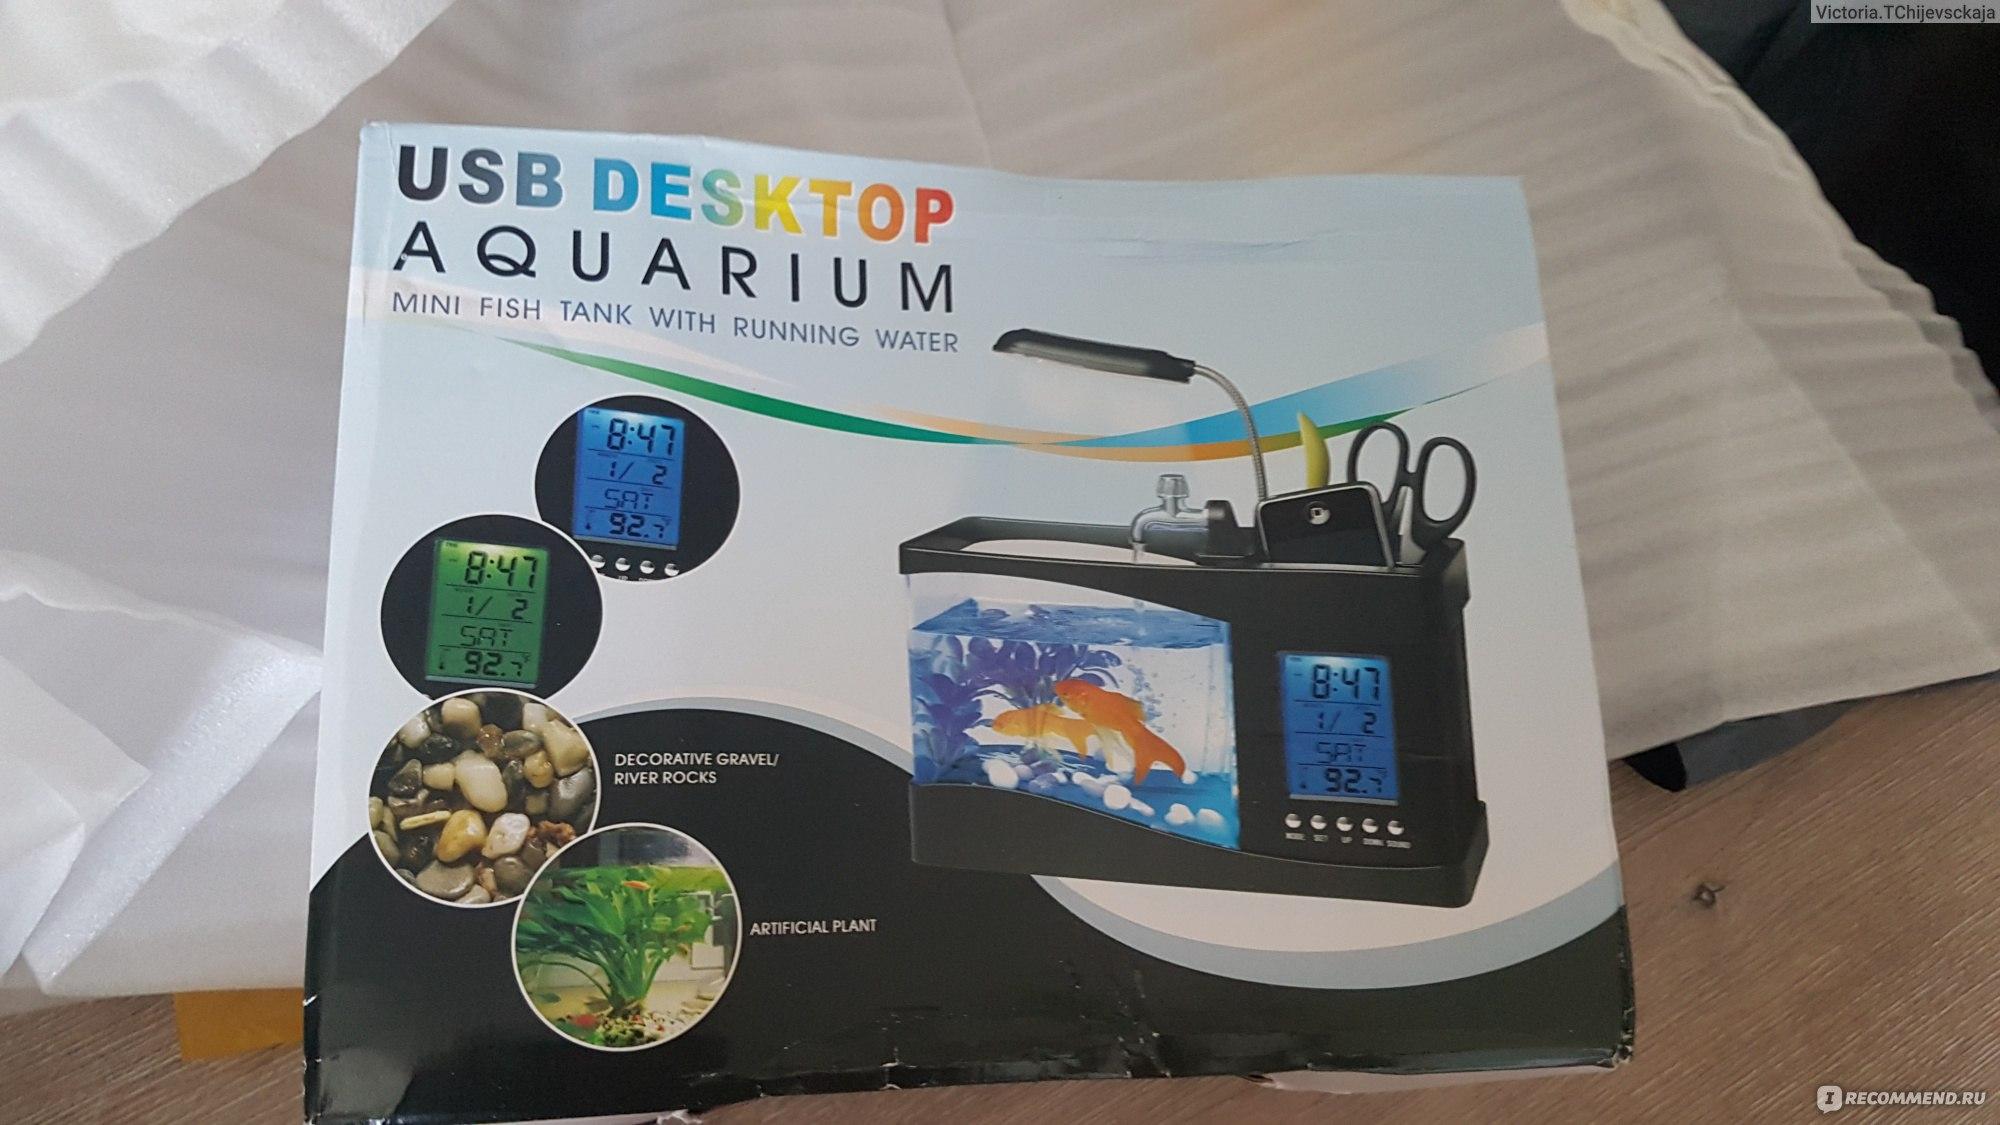 836817b852b595 Аквариум Aliexpress Настольный, с органайзером. S72Mini LCD Desktop Fish  Tank Aquarium Clock Timer USB